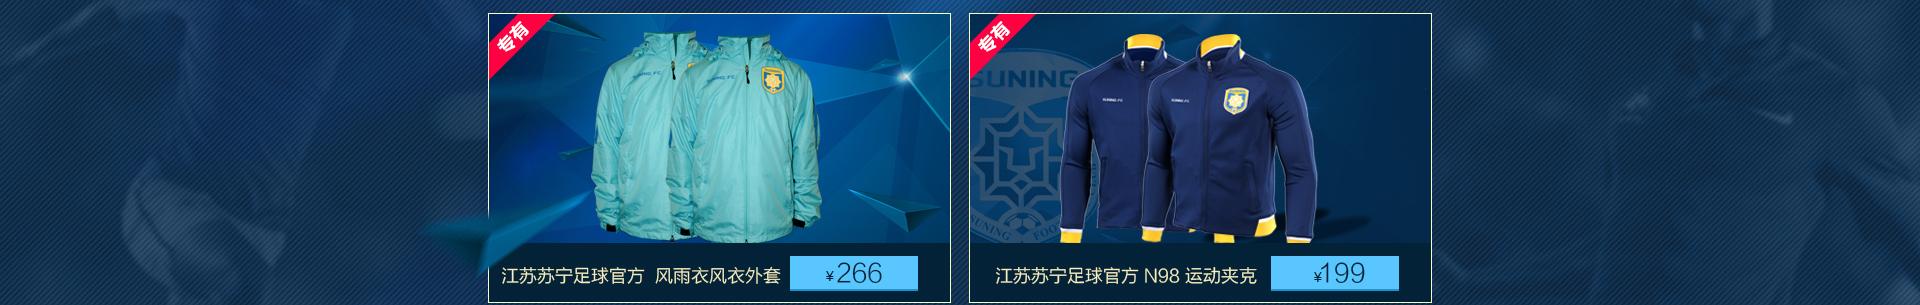 http://image.suning.cn/uimg/sop/commodity/198558745318155871131531_x.jpg